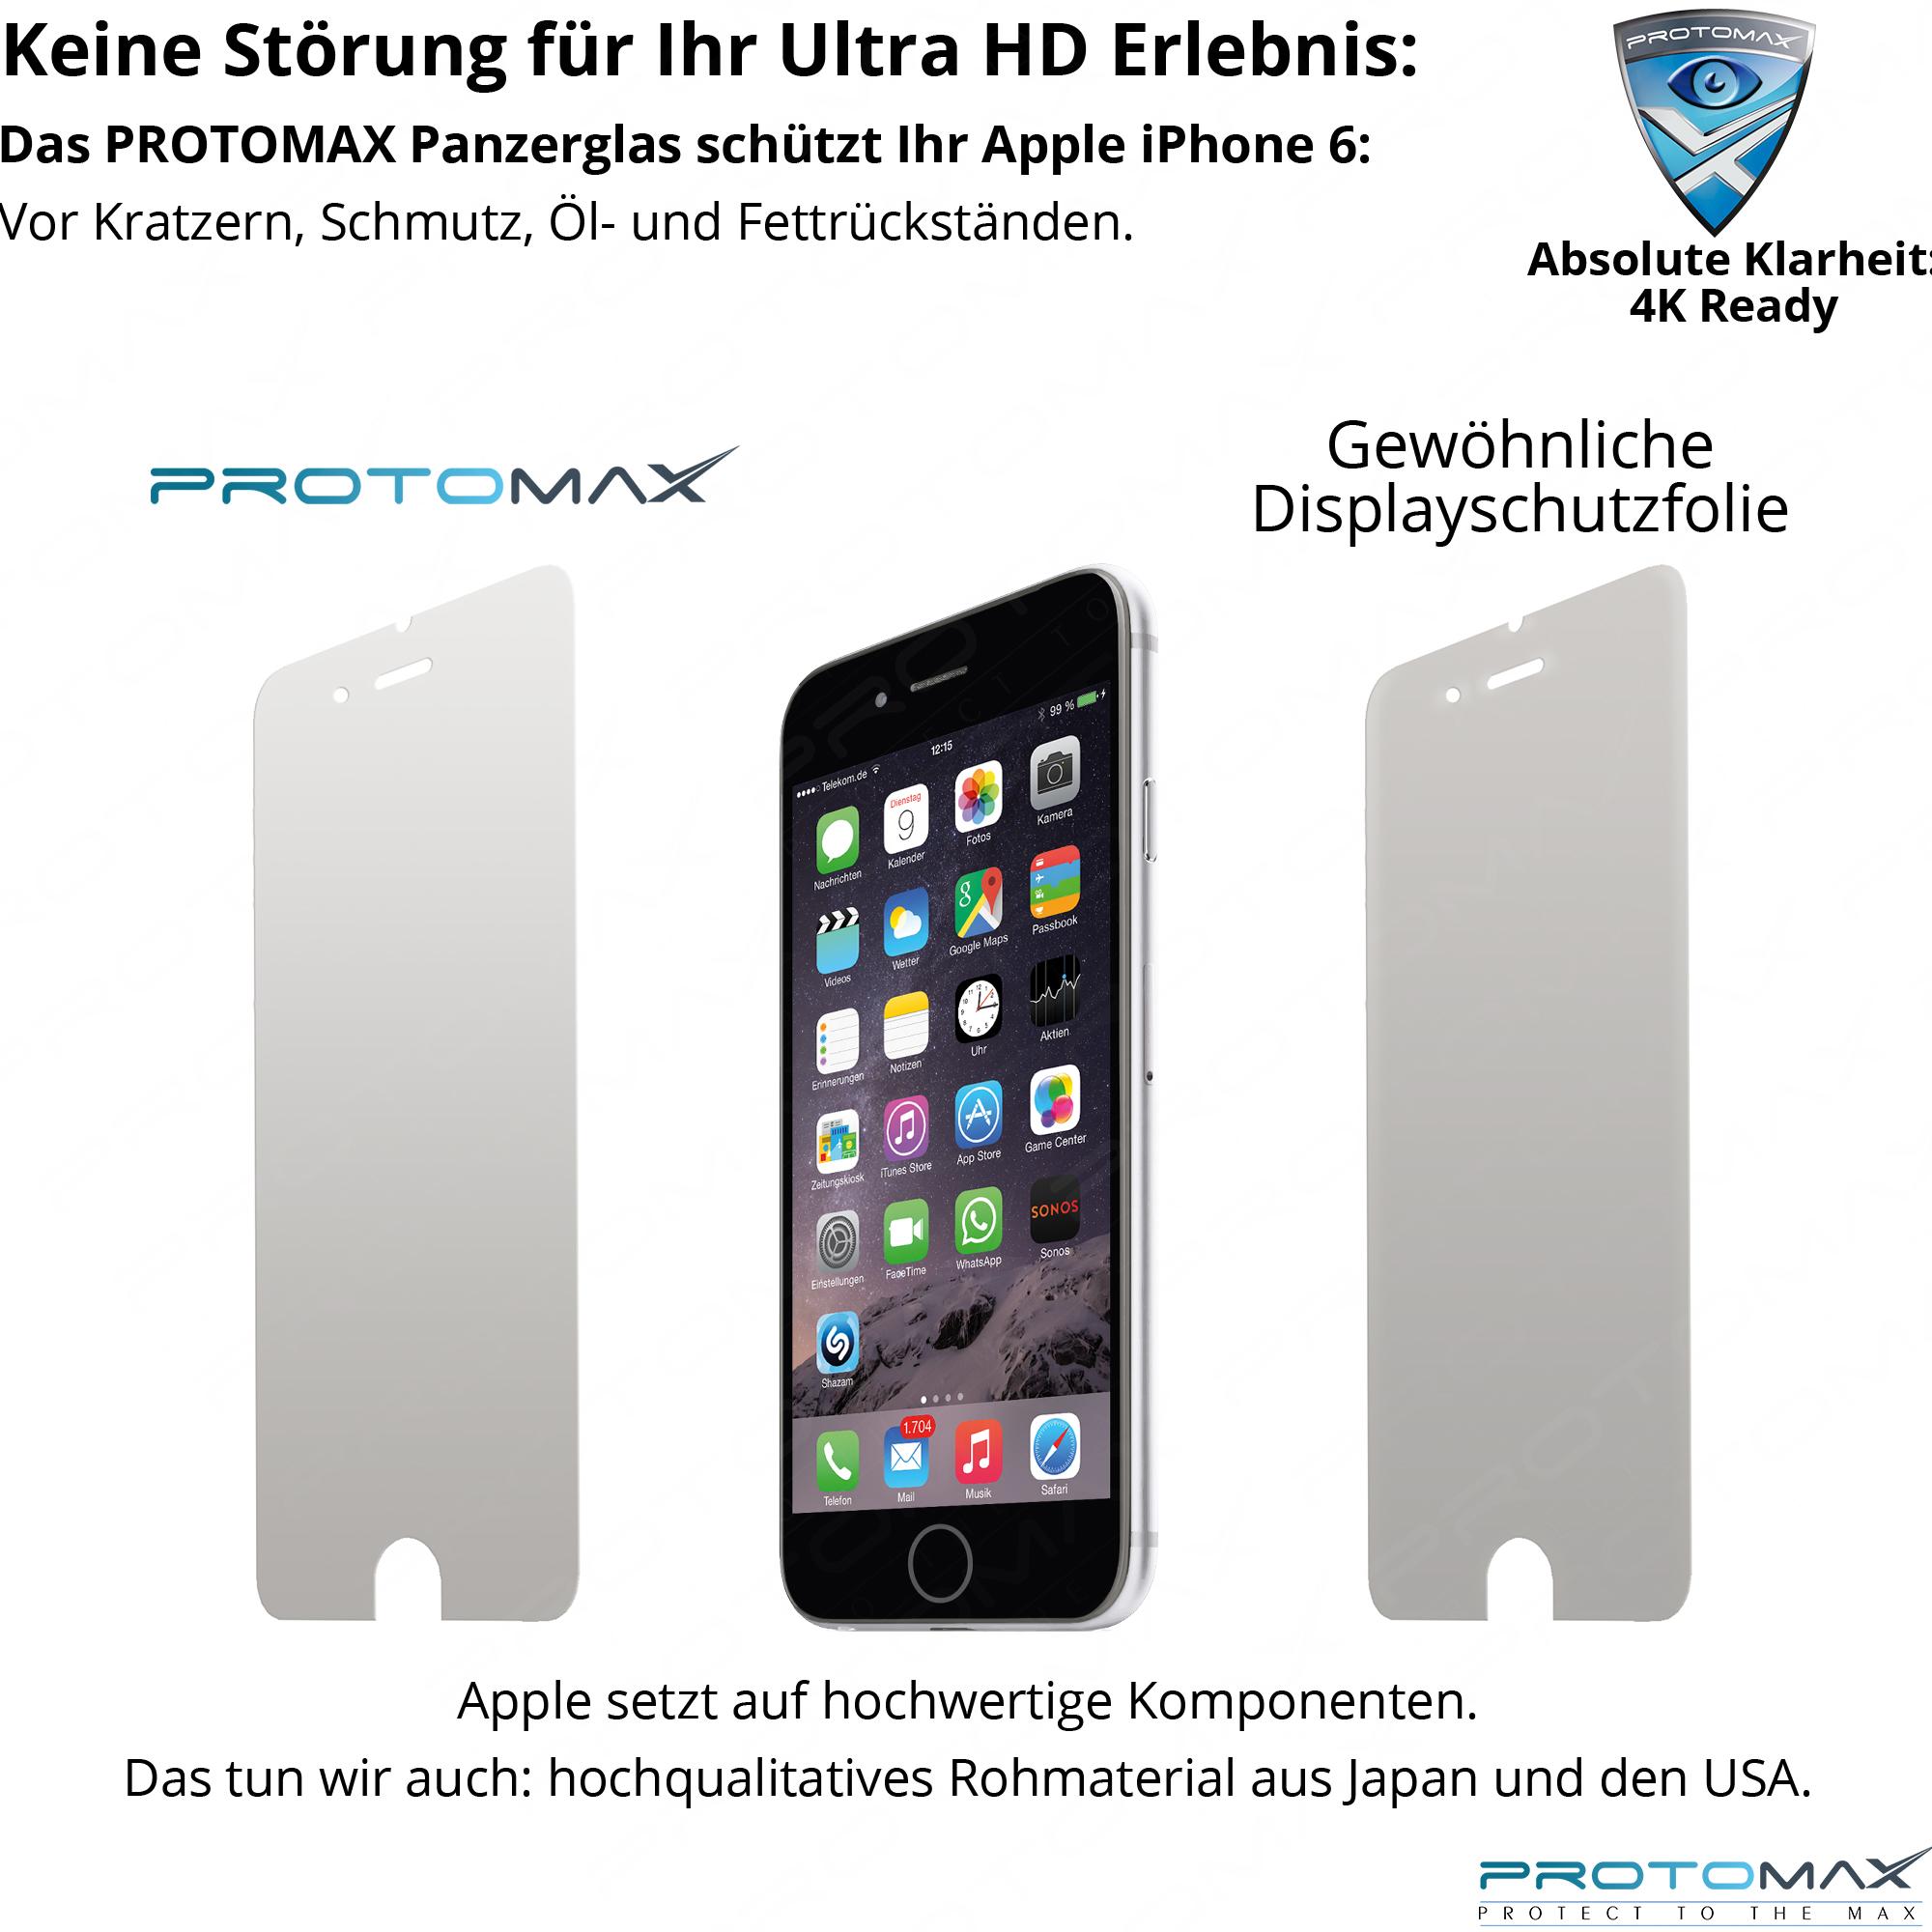 apple iphone 6 iphone 6 plus panzerglas. Black Bedroom Furniture Sets. Home Design Ideas